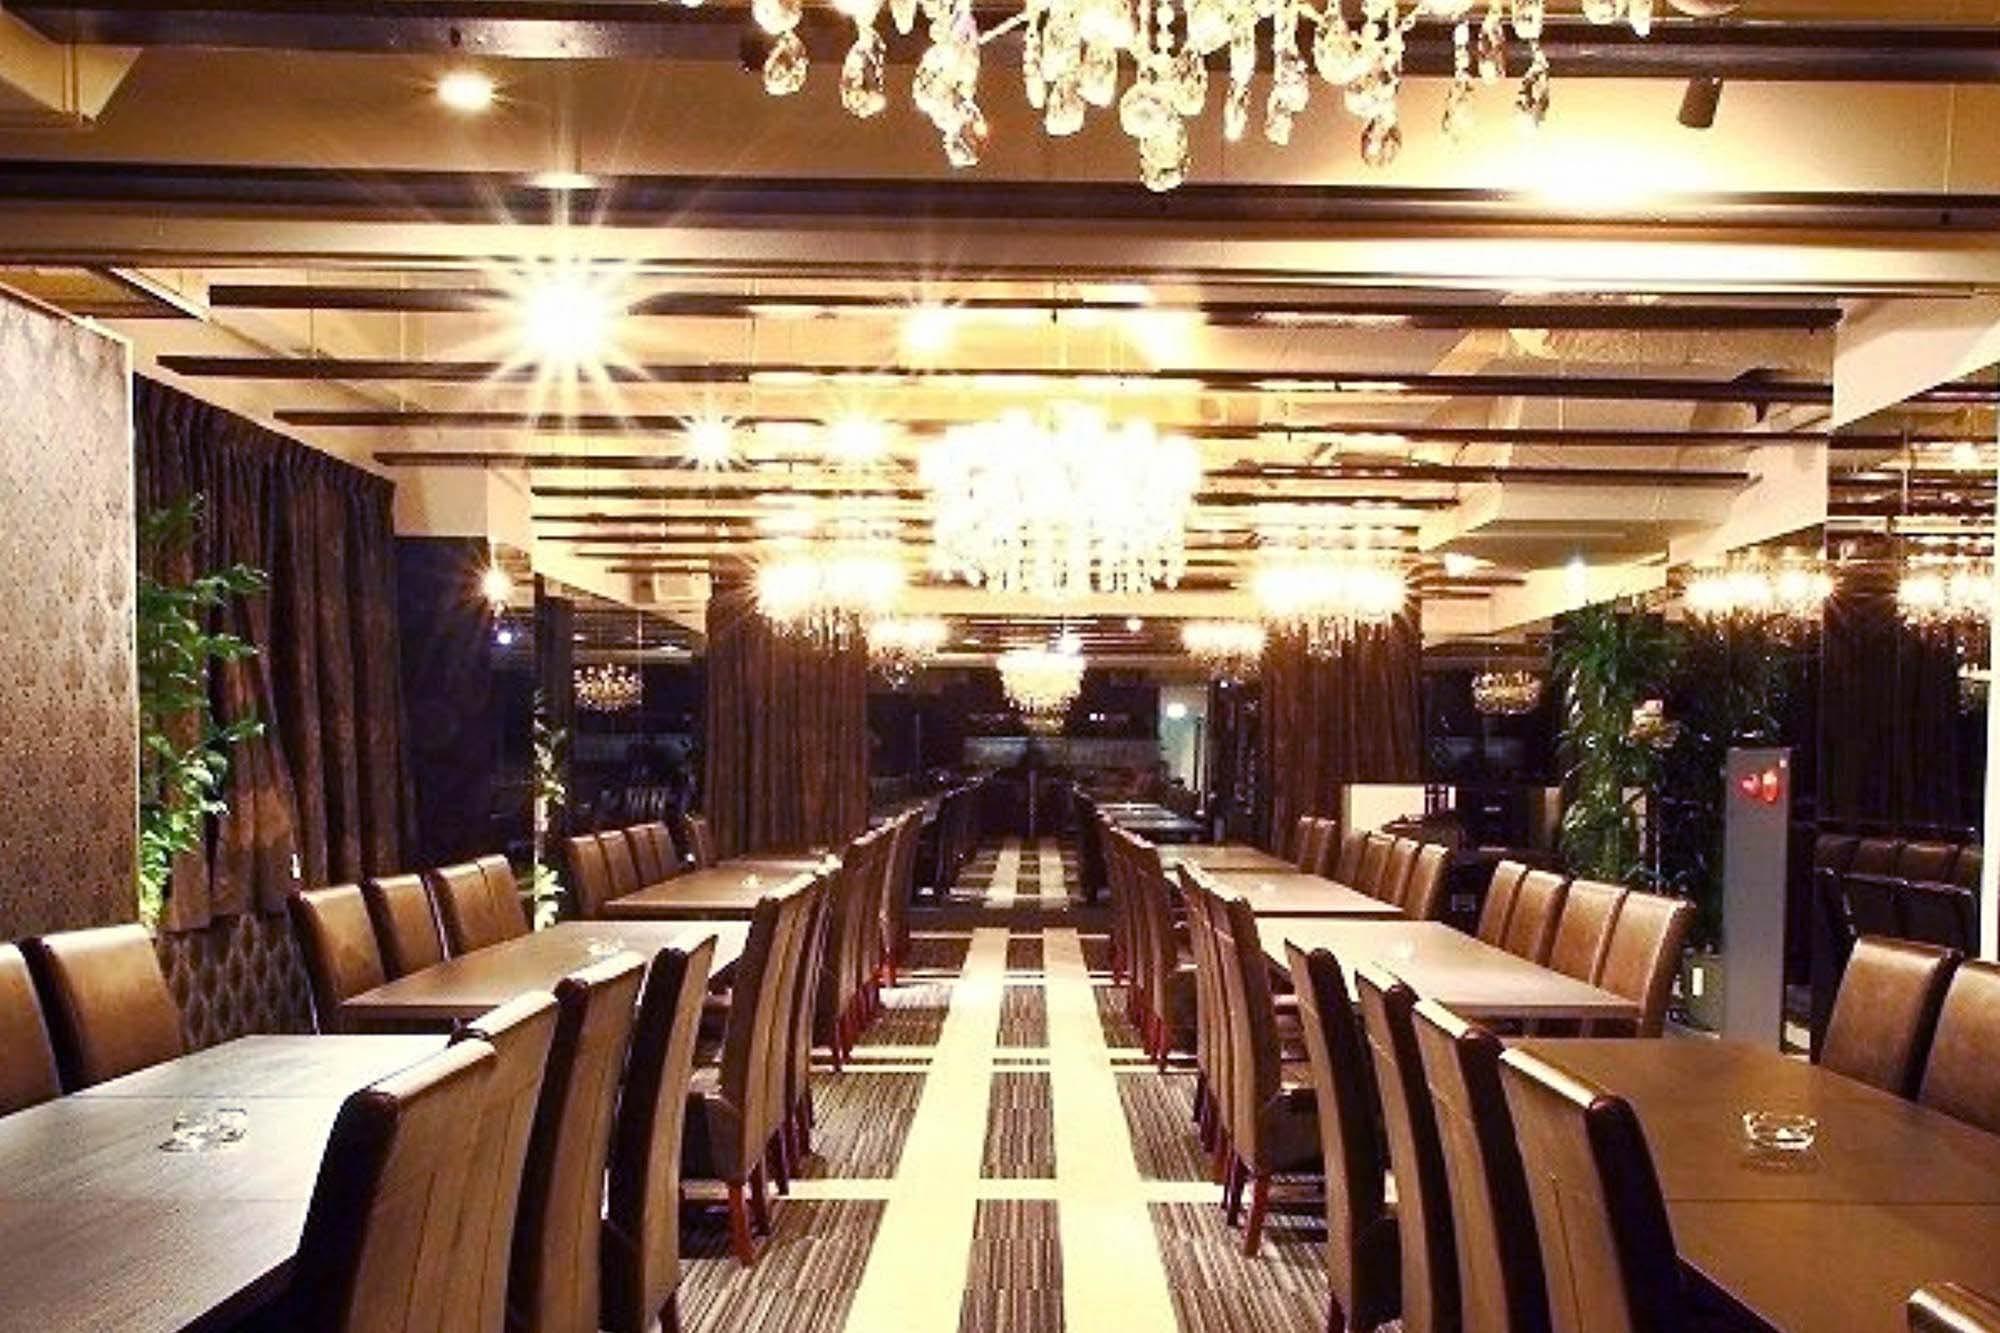 粋-IKI- KYOTO TERAMACHI DINING